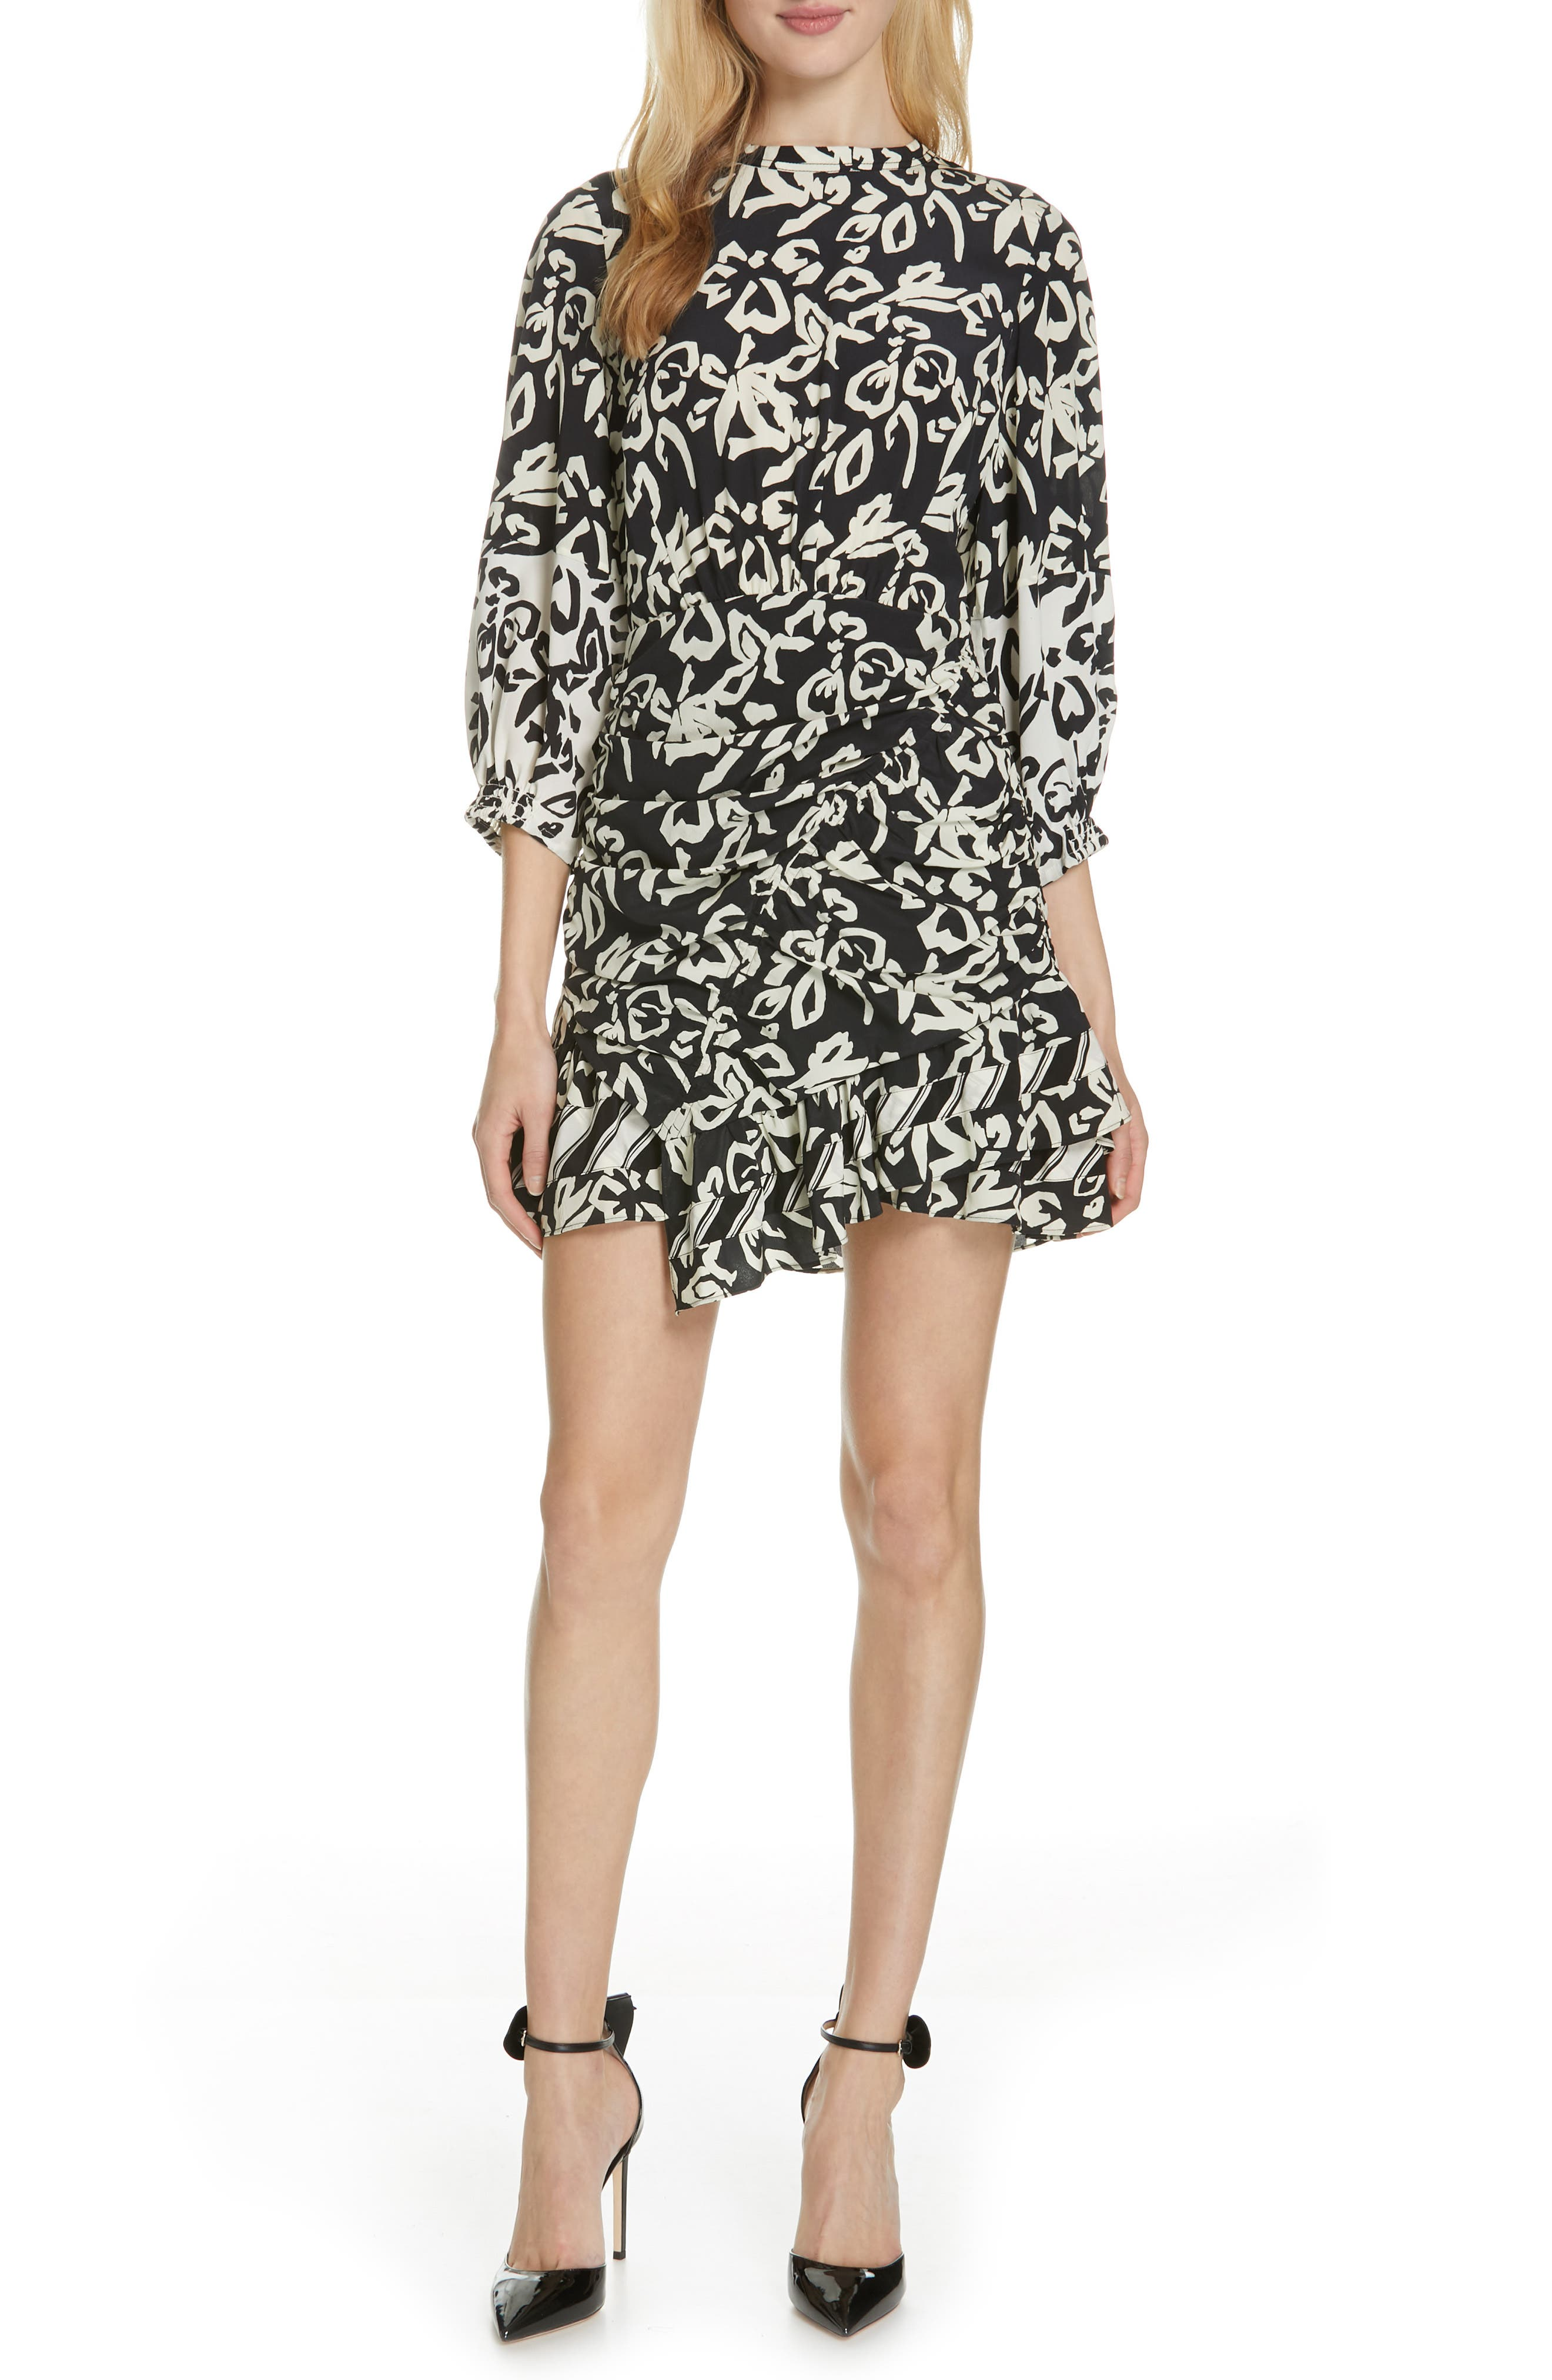 TANYA TAYLOR Mel Printed Ruched Silk Flounce Short Dress in Black